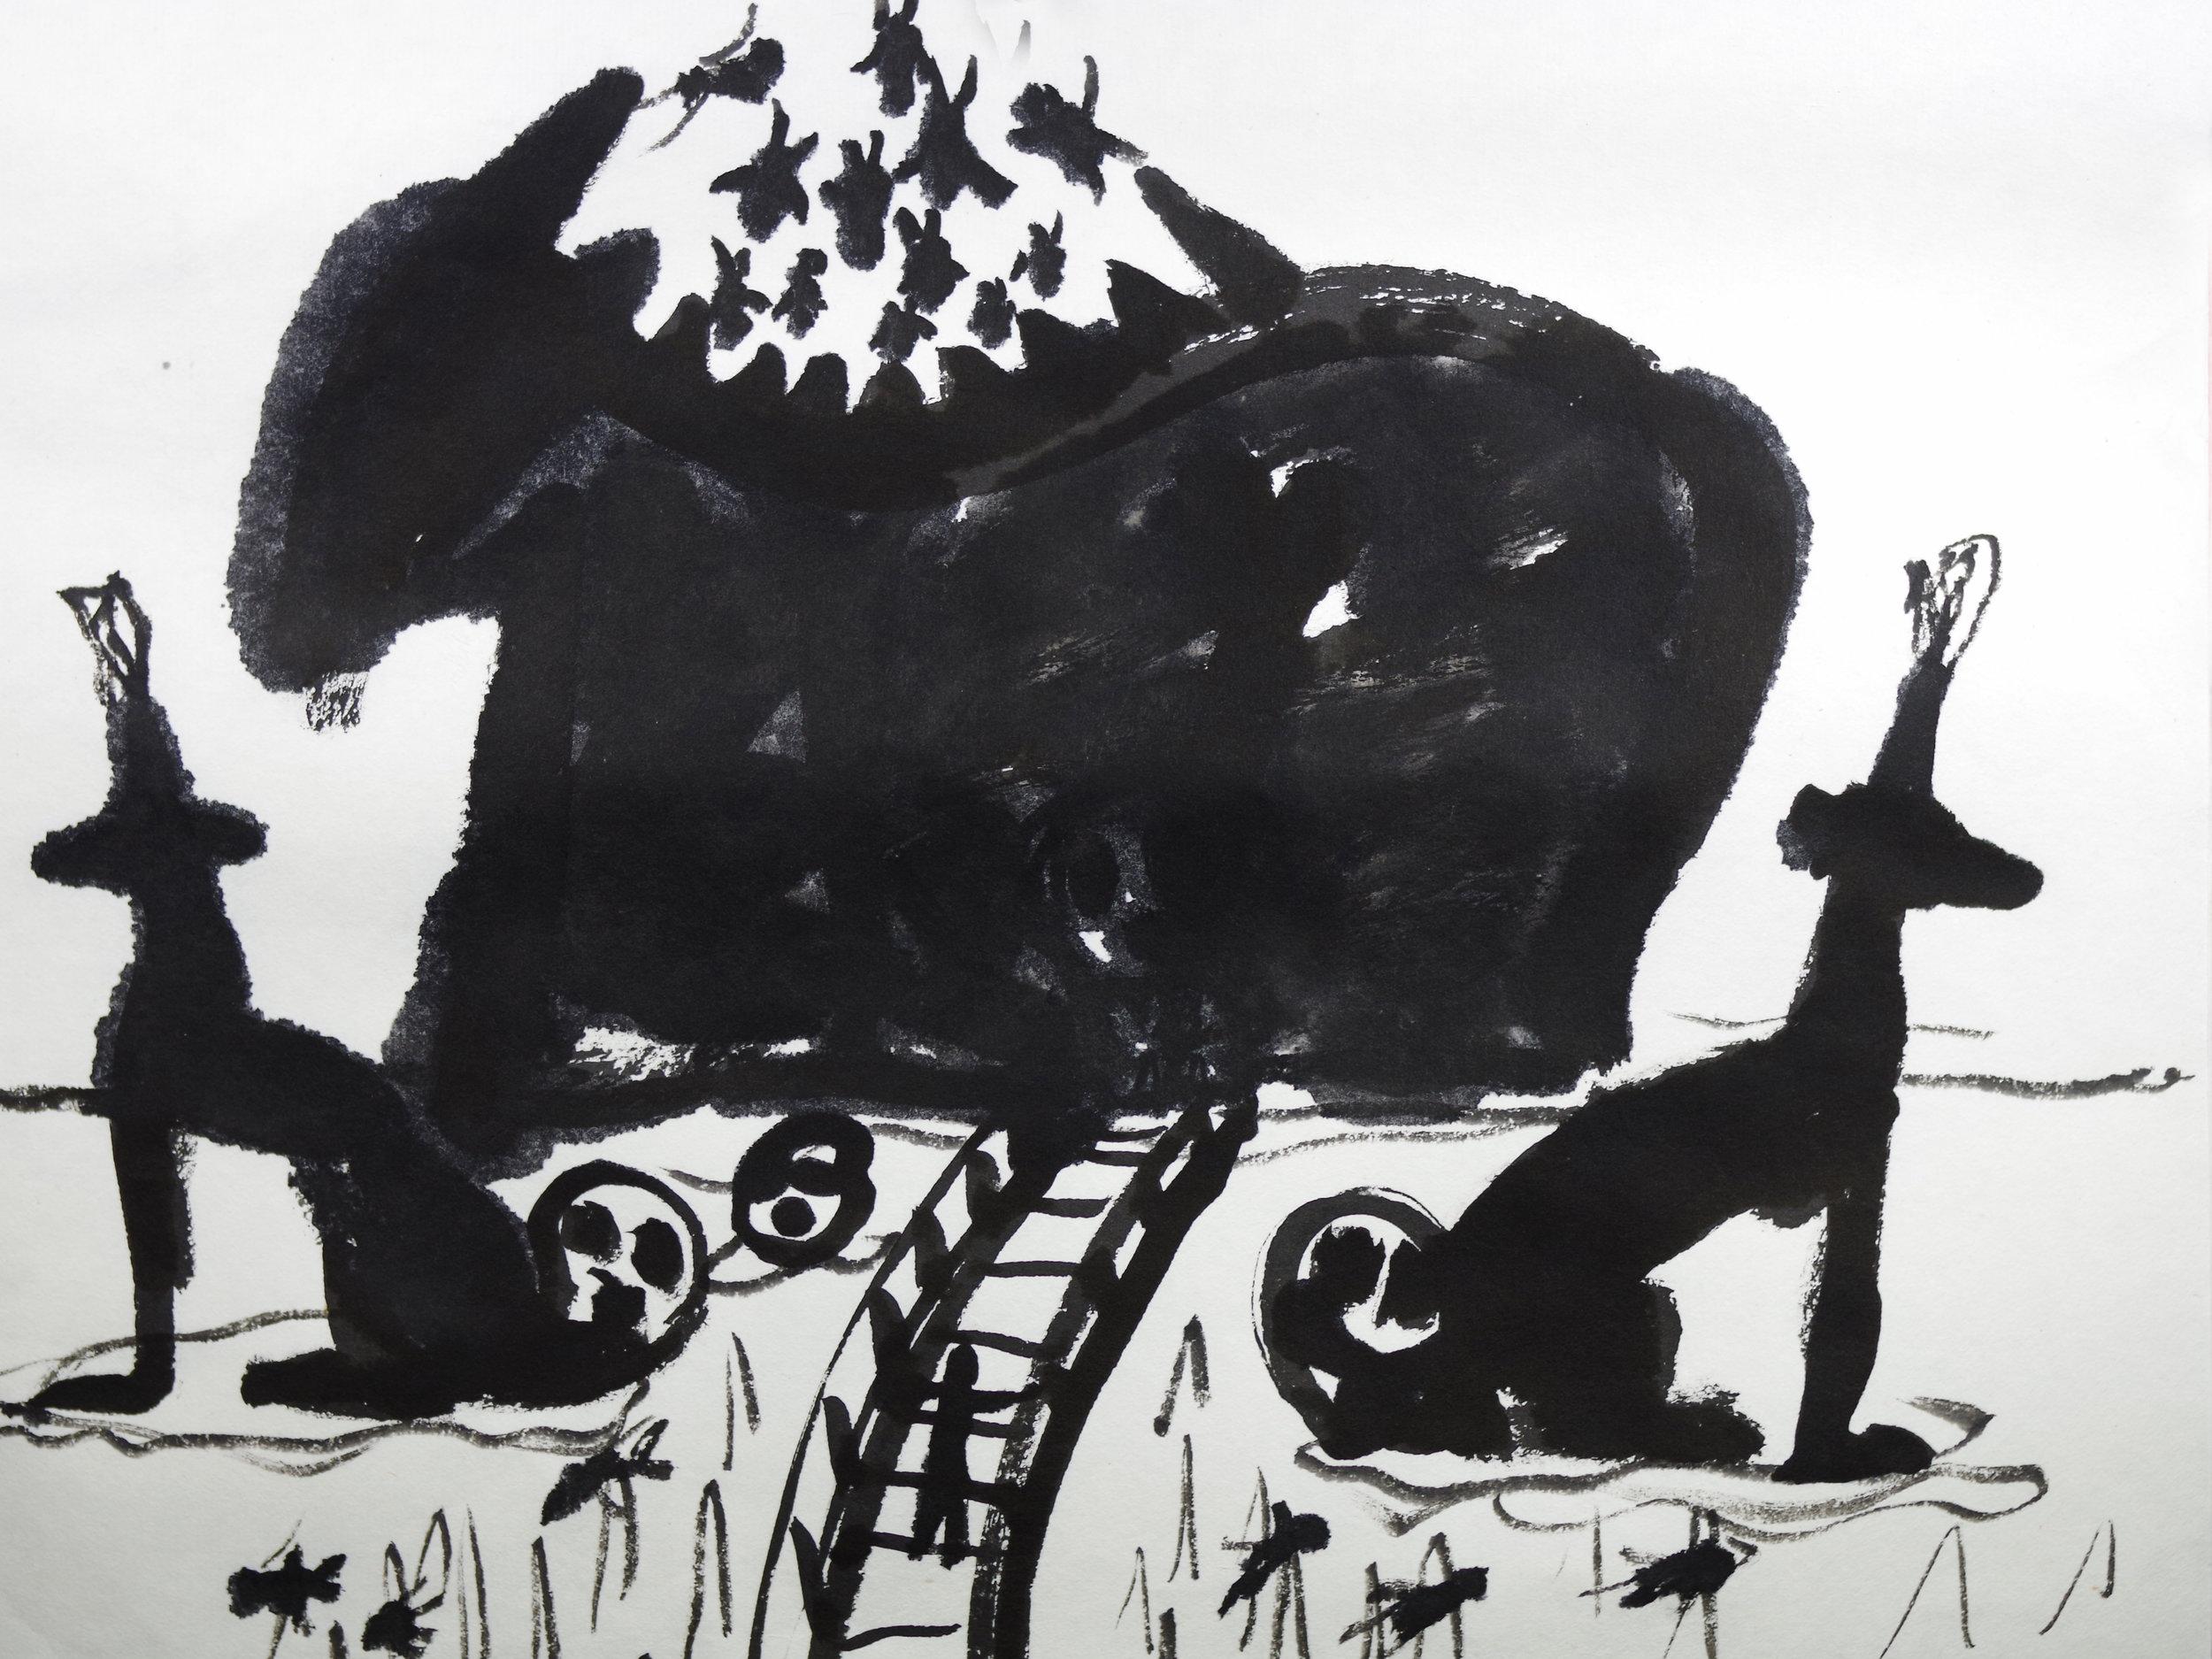 - 作品名称:《水墨动画第二部分——危险》导演:朱赫制片:朱赫国家/地区:中国创作时间:2013 编剧:朱赫美术:朱赫音乐:朱赫片长:2分54秒Title: The Second part of Ink Animation— The DangerDirector: Zhu HeProducer(s): Zhu He Country/Area: China Year of Production: 2013 Screenplay: Zhu He Design: Zhu HeMusic: Zhu HeLength: 2 mins 54 secs《水墨动画第二部分——危险》作品介绍主人公灵魂被窃取后(第一部分)掉到了邪恶恶魔的老巢,他亲眼见证了魔鬼吃人的场景,魔鬼头发现他欲将他吃掉的时候,被天神发现并出手相救......The Synopsis of The Second part of Ink Animation—The Danger After the soul of the hero has been partly stolen (The 1st Part), he drops into evil monster's den where he witnesses the cannibal scene by the monster. The monster finds out his appearance and tends to devour him, but god suddenly shows up and saves him.